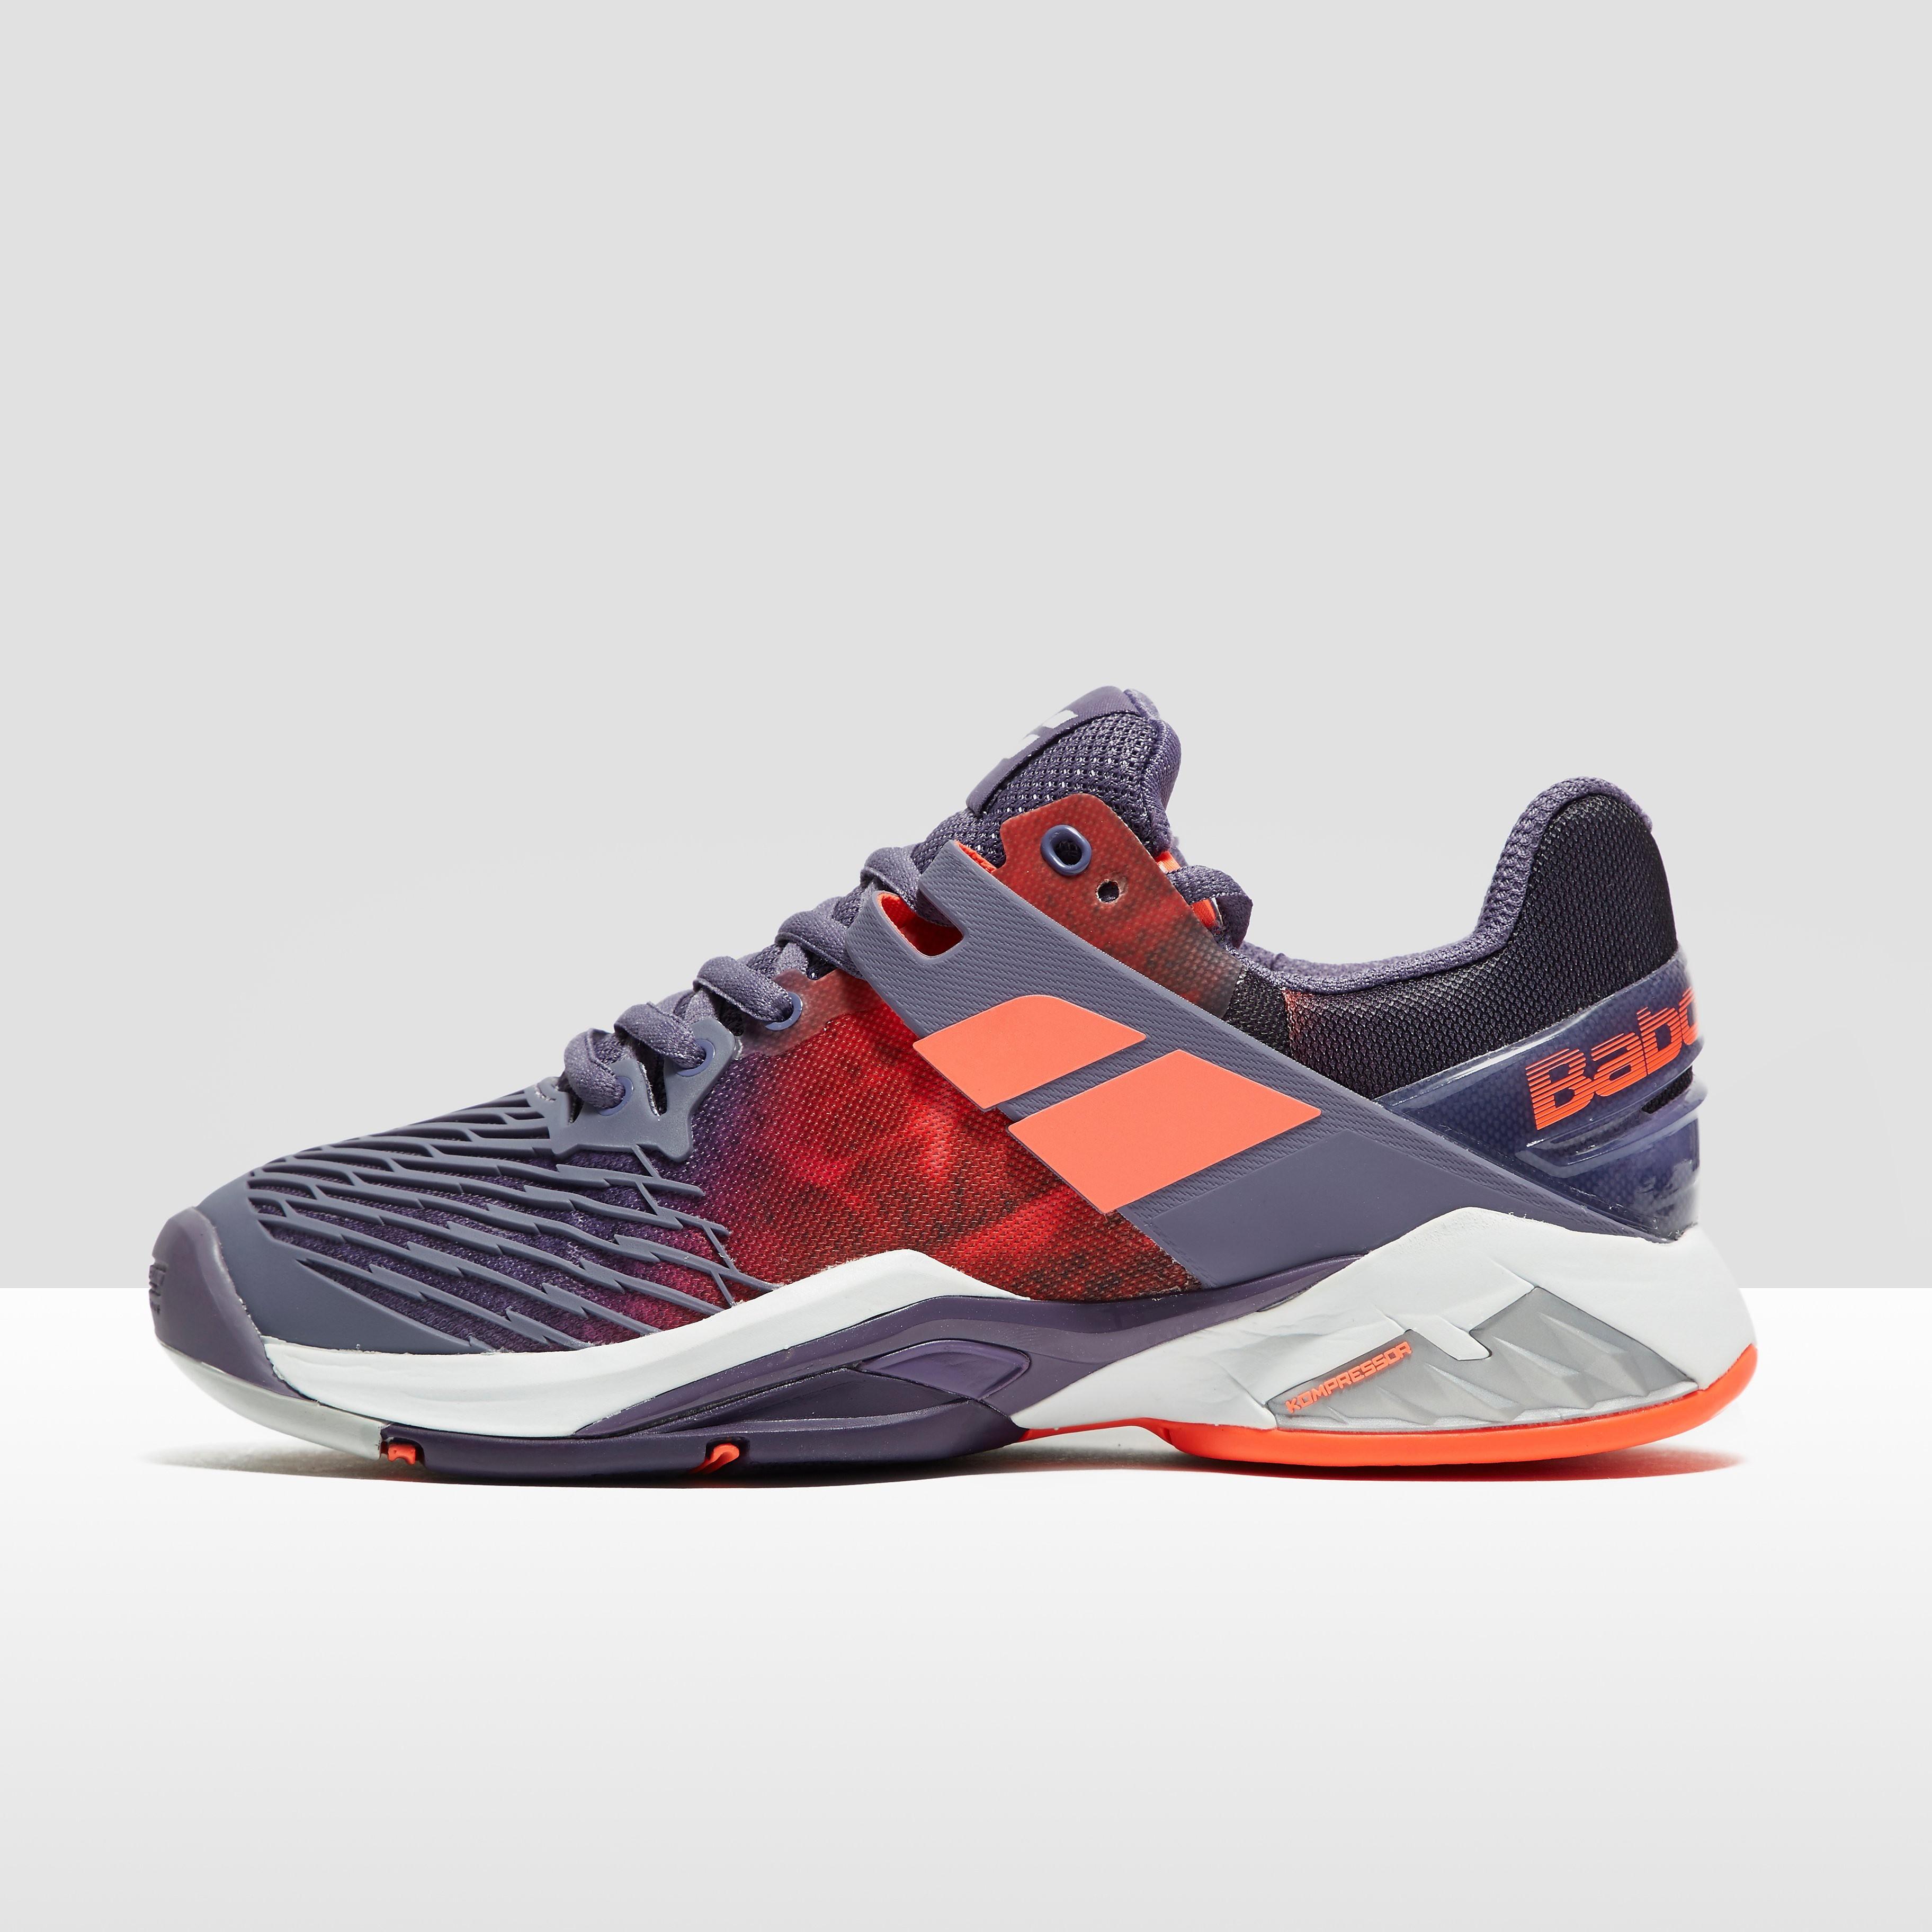 Babolat Propulse Fury All Court Women's Tennis Shoes